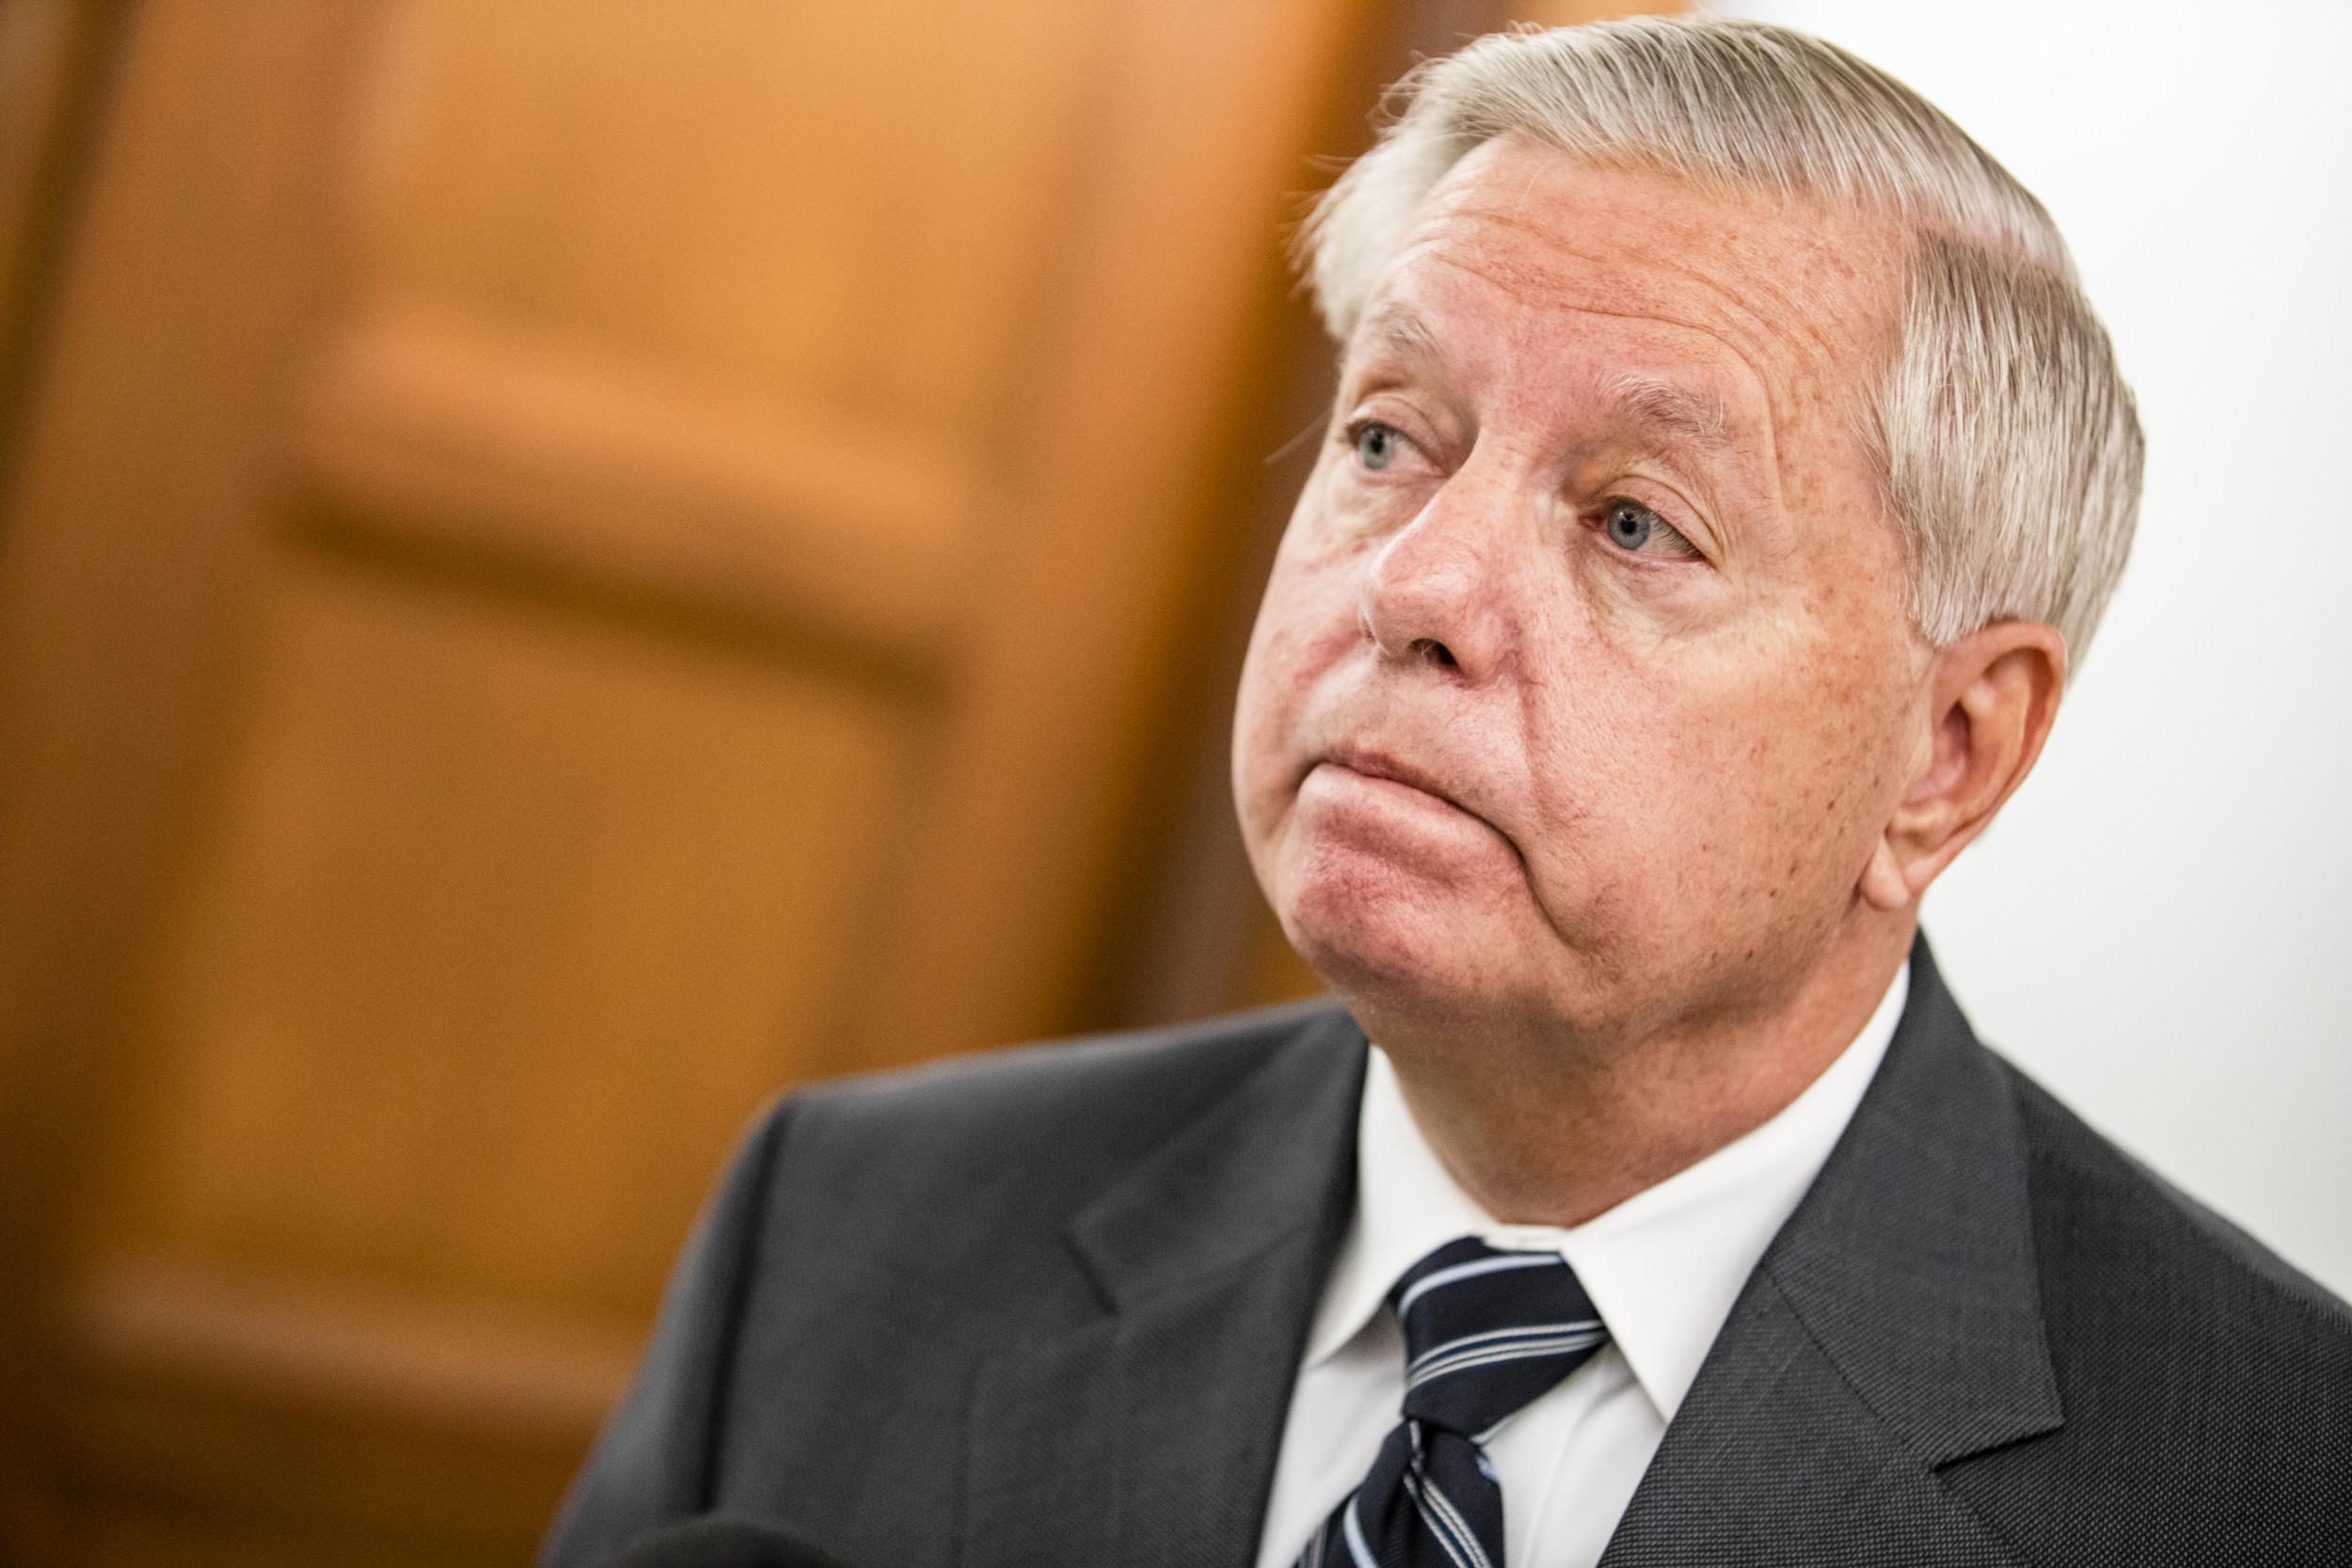 Lindsey Graham critics want probes, judiciary resignation over Georgia ballot claims